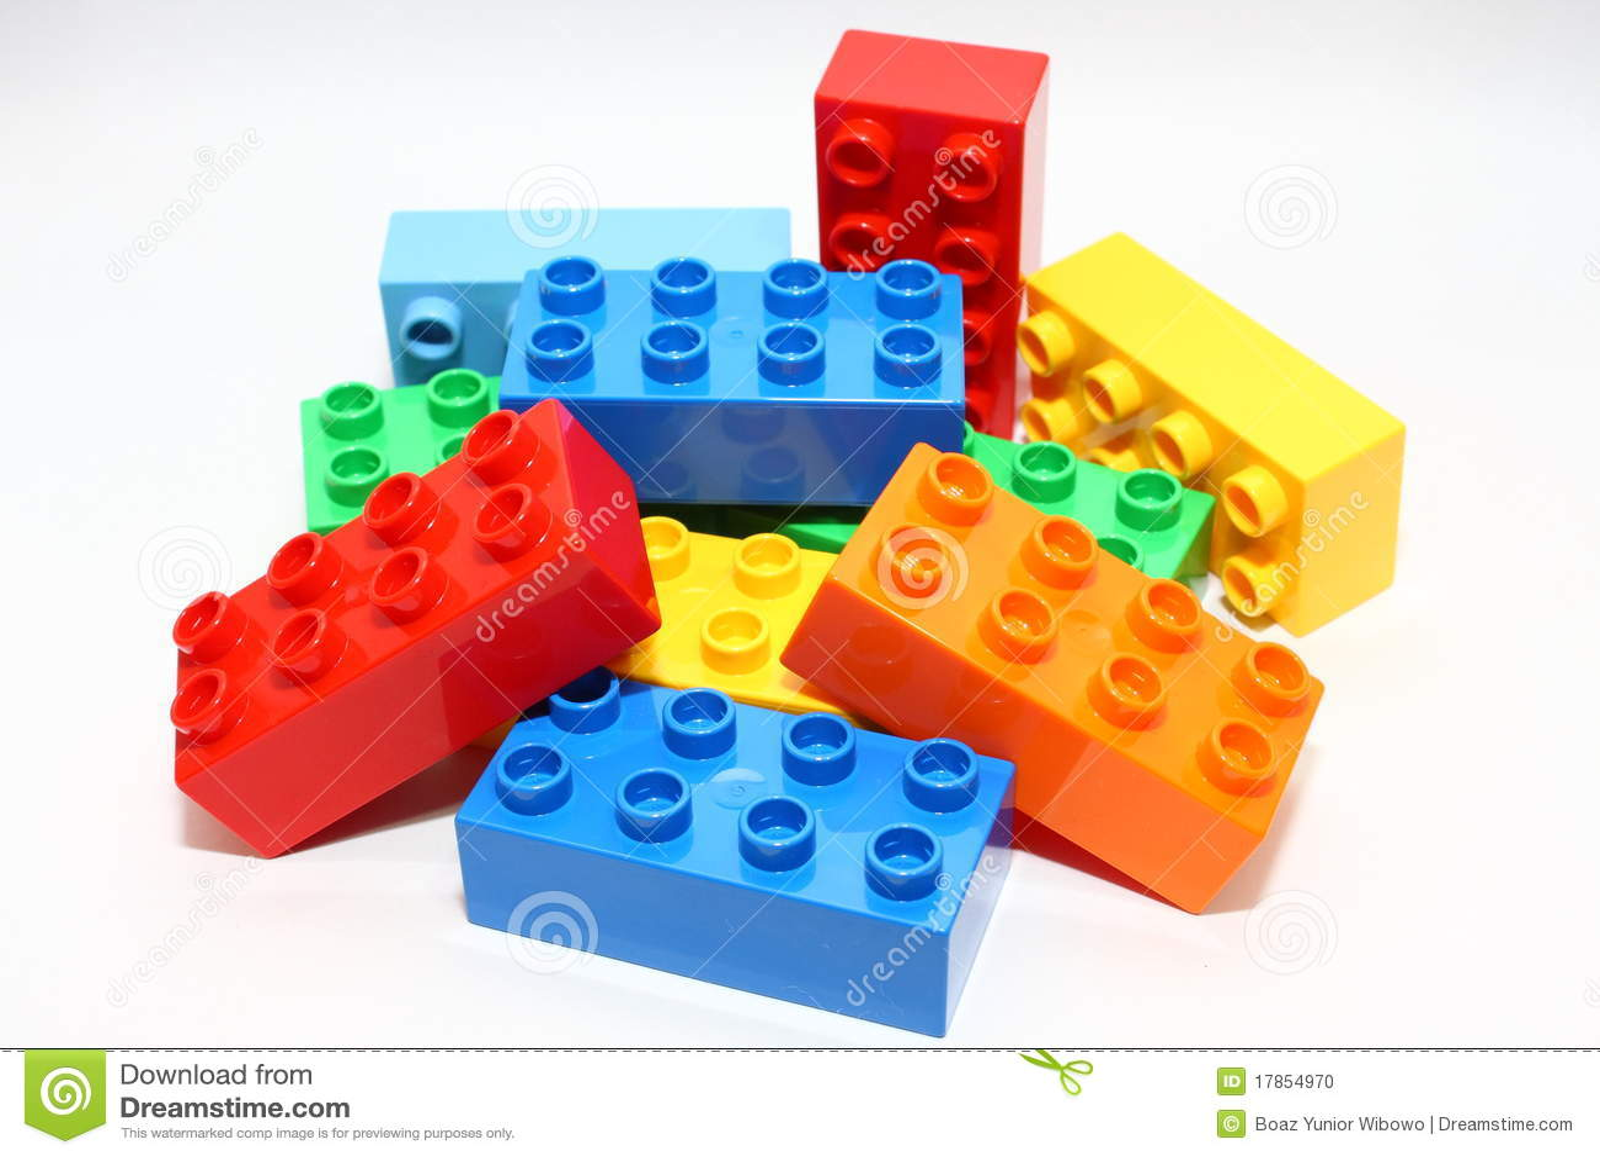 lego blocks stock photo image of teamwork connect building 17854970. Black Bedroom Furniture Sets. Home Design Ideas